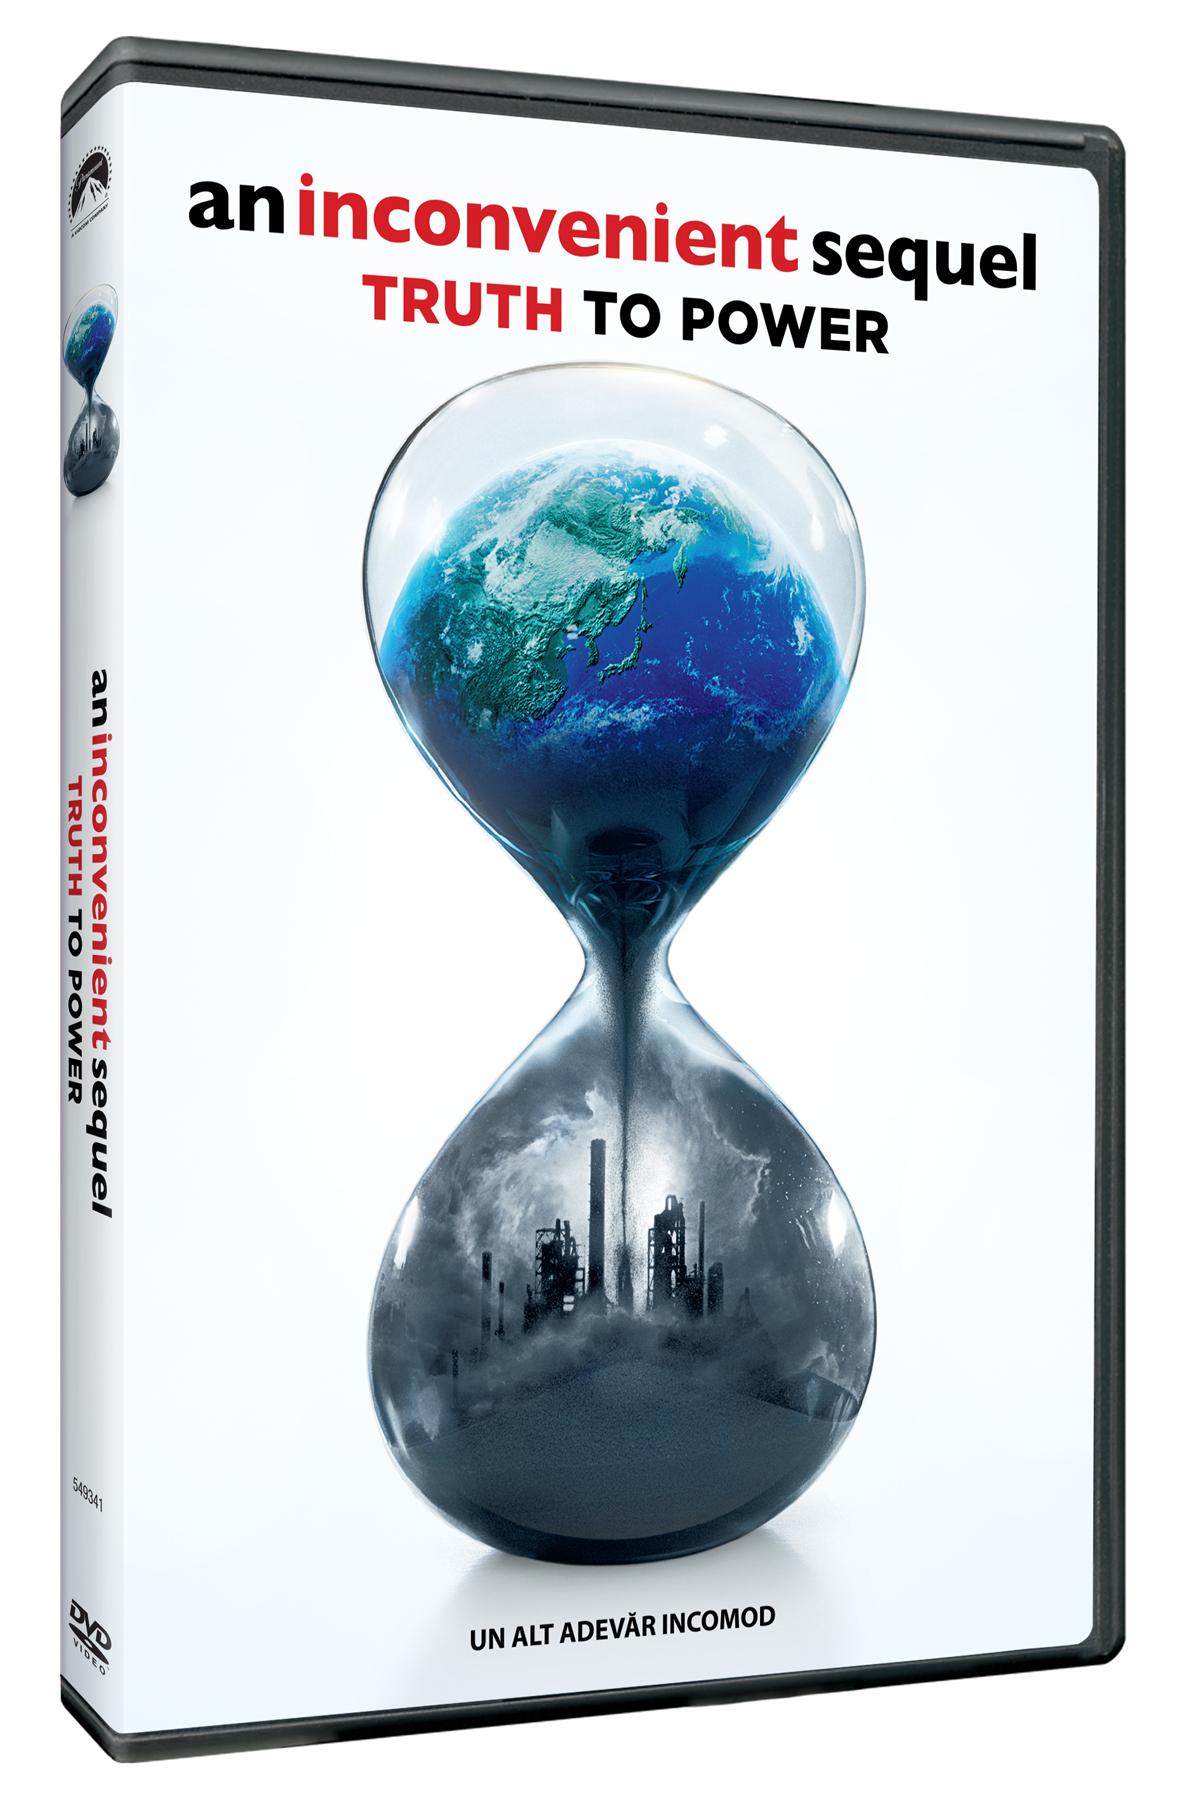 Un alt adevar incomod / An Inconvenient Sequel - Truth to Power